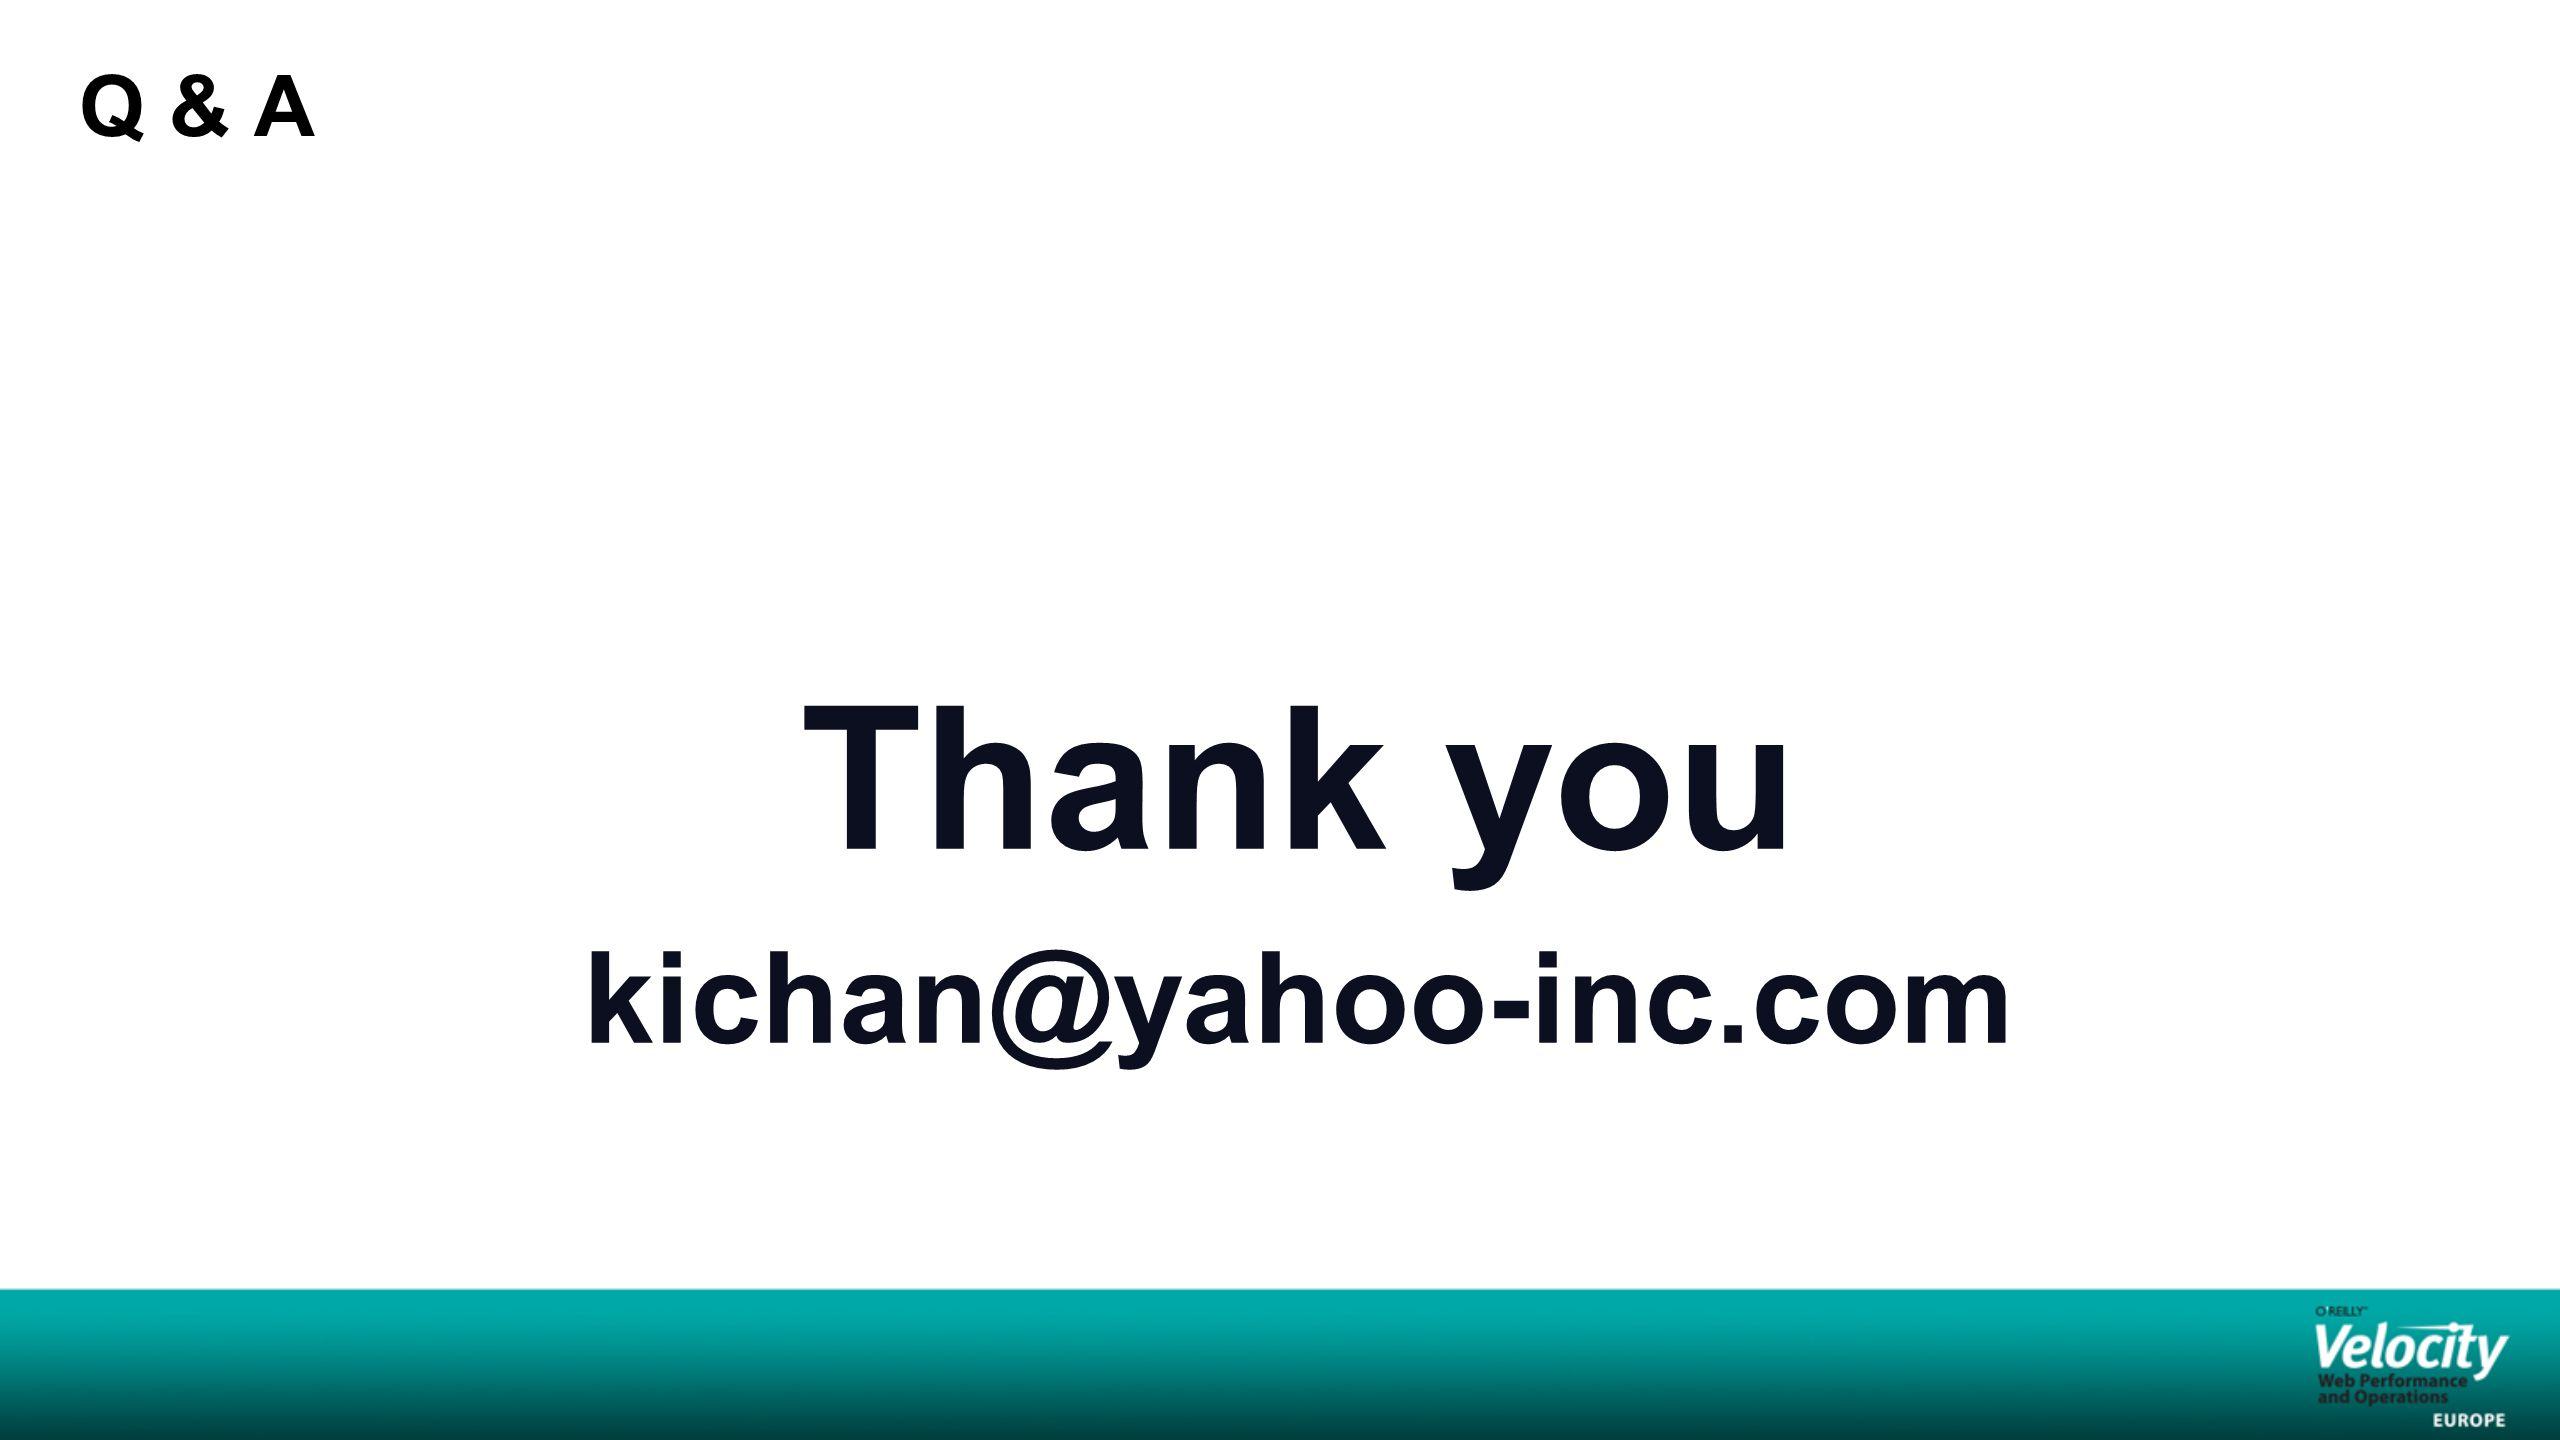 Q & A Thank you kichan@yahoo-inc.com